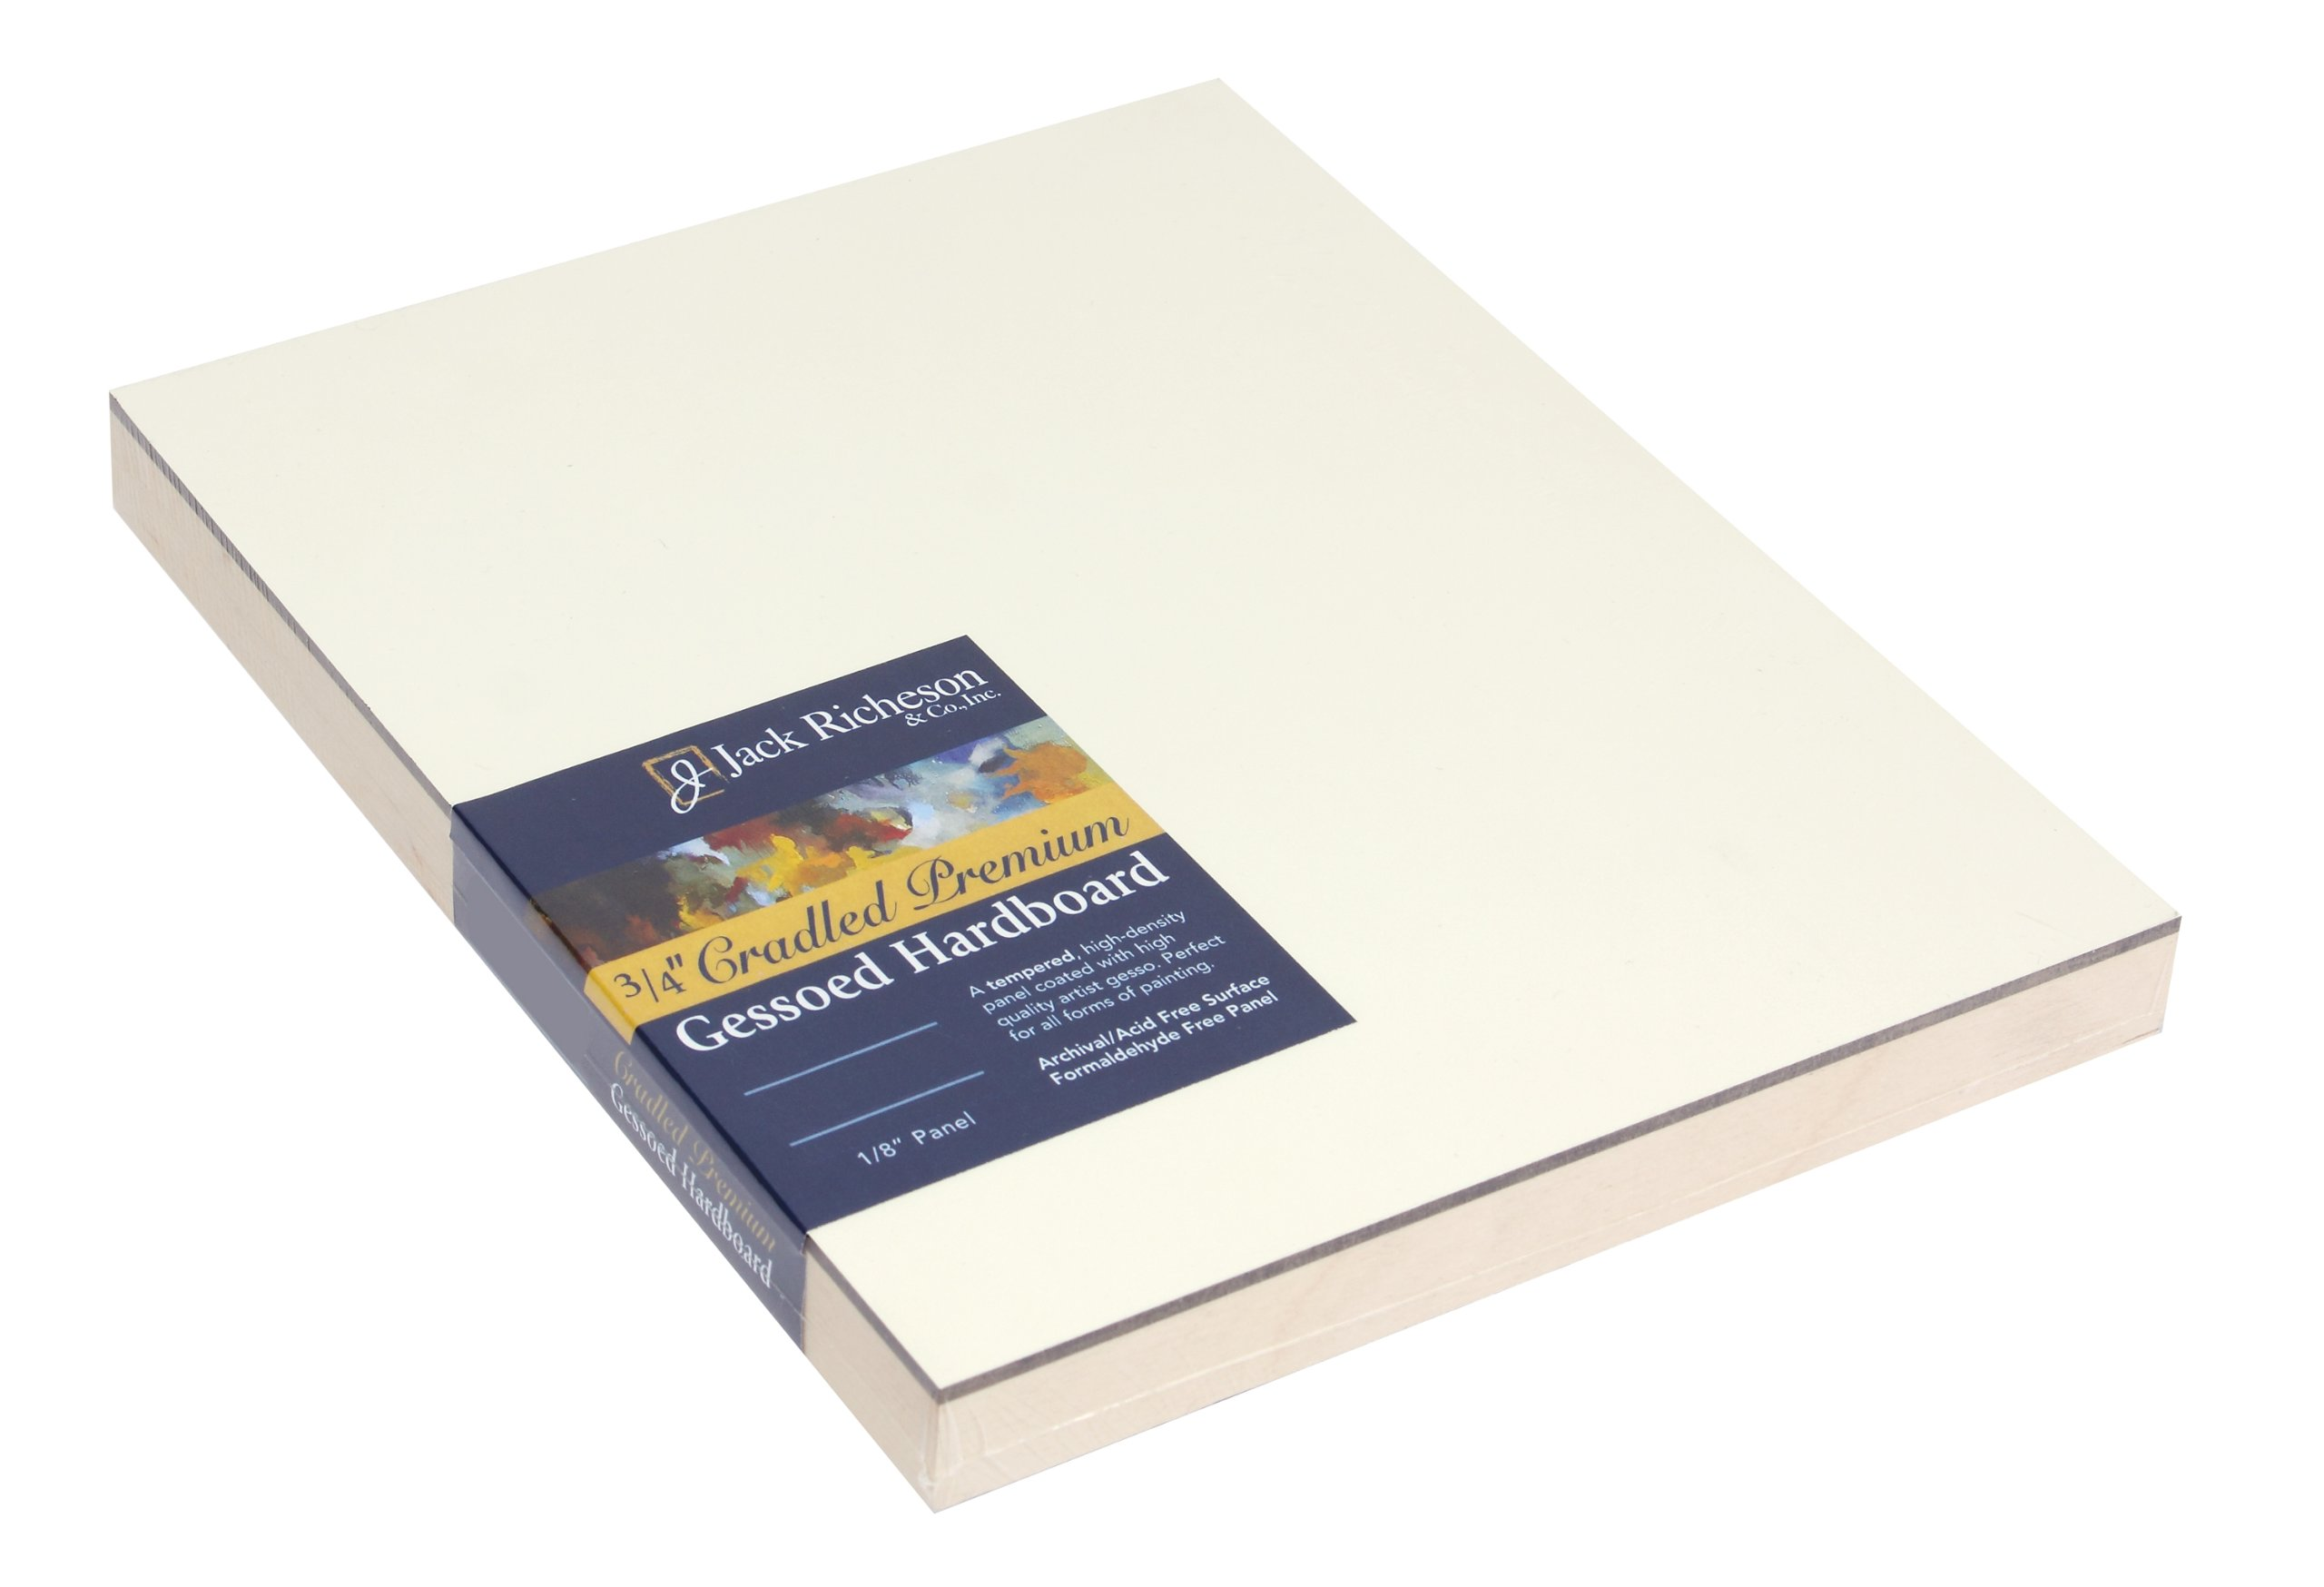 Jack Richeson 3/4-Inch Premium Tempered Gessoed Hardboard Panel, 6-Inch by 6-Inch